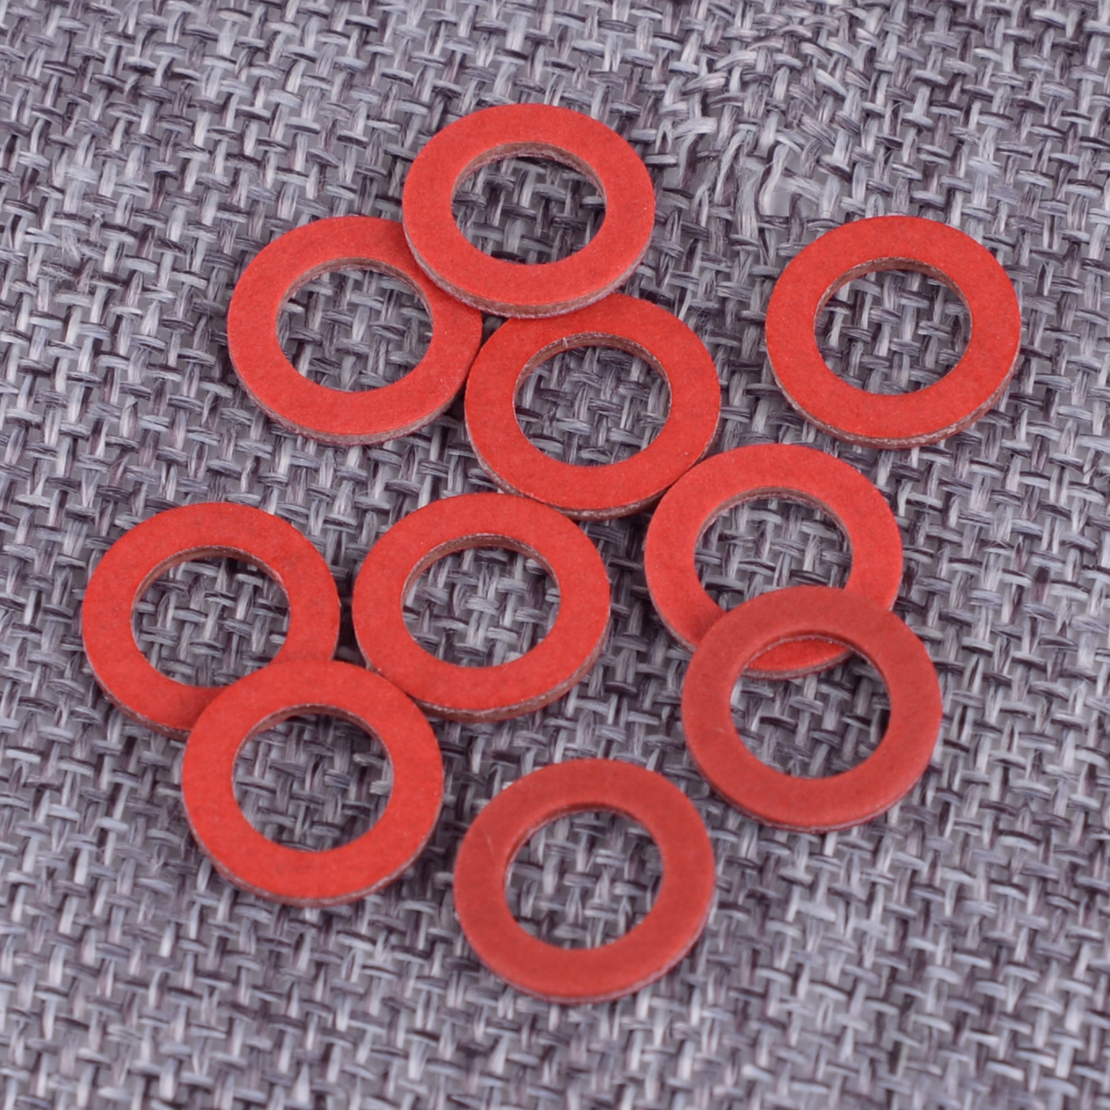 DWCX 10pcs Red Lower Unit Oil Drain Screw Gasket Fit For Yamaha 90430-08020-00 90430-08003 Accessories